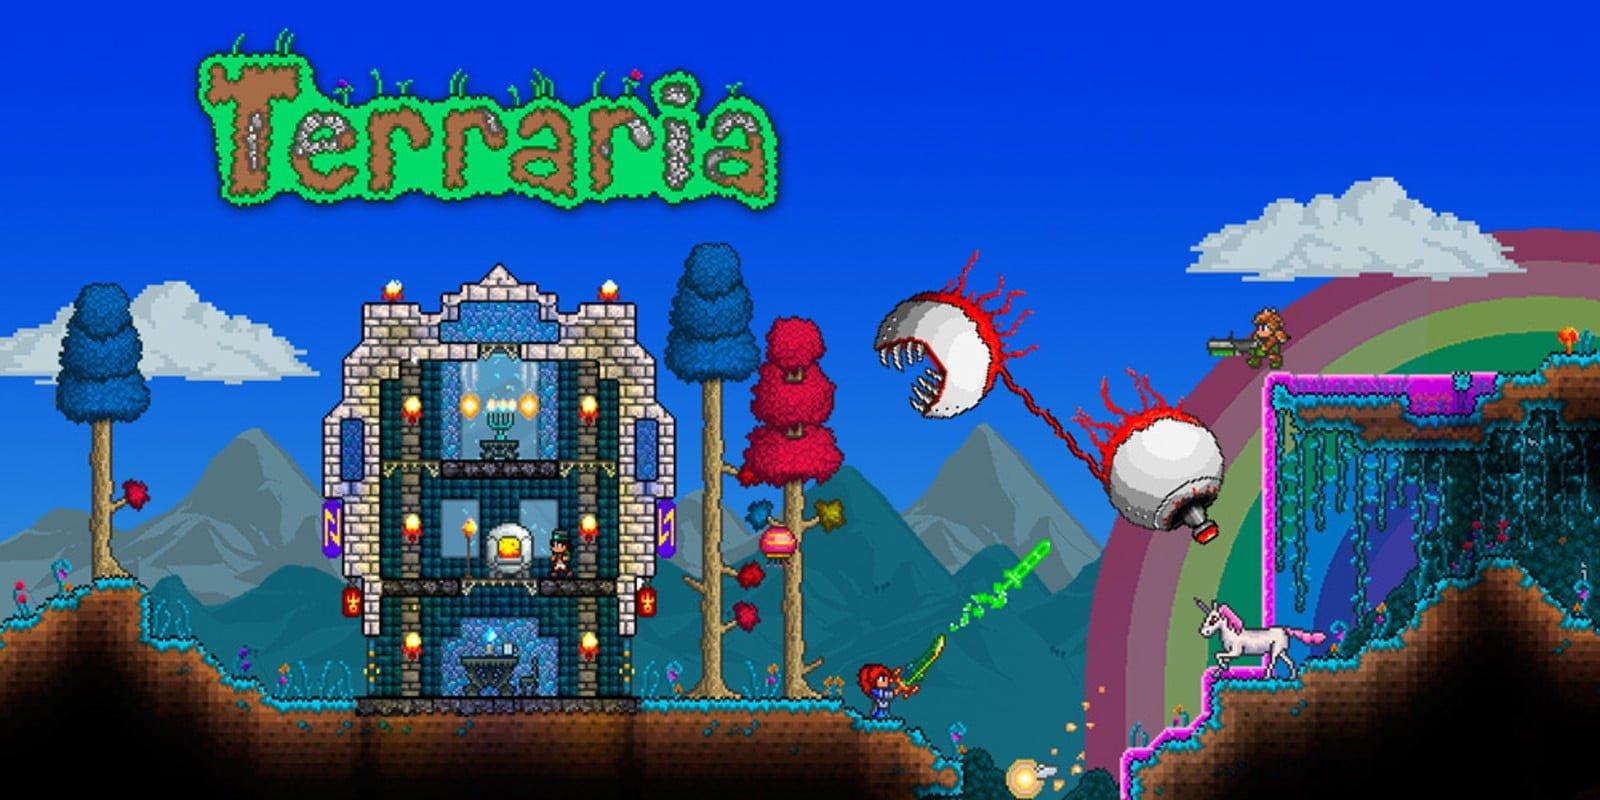 Terraria PC Version Full Game Free Download